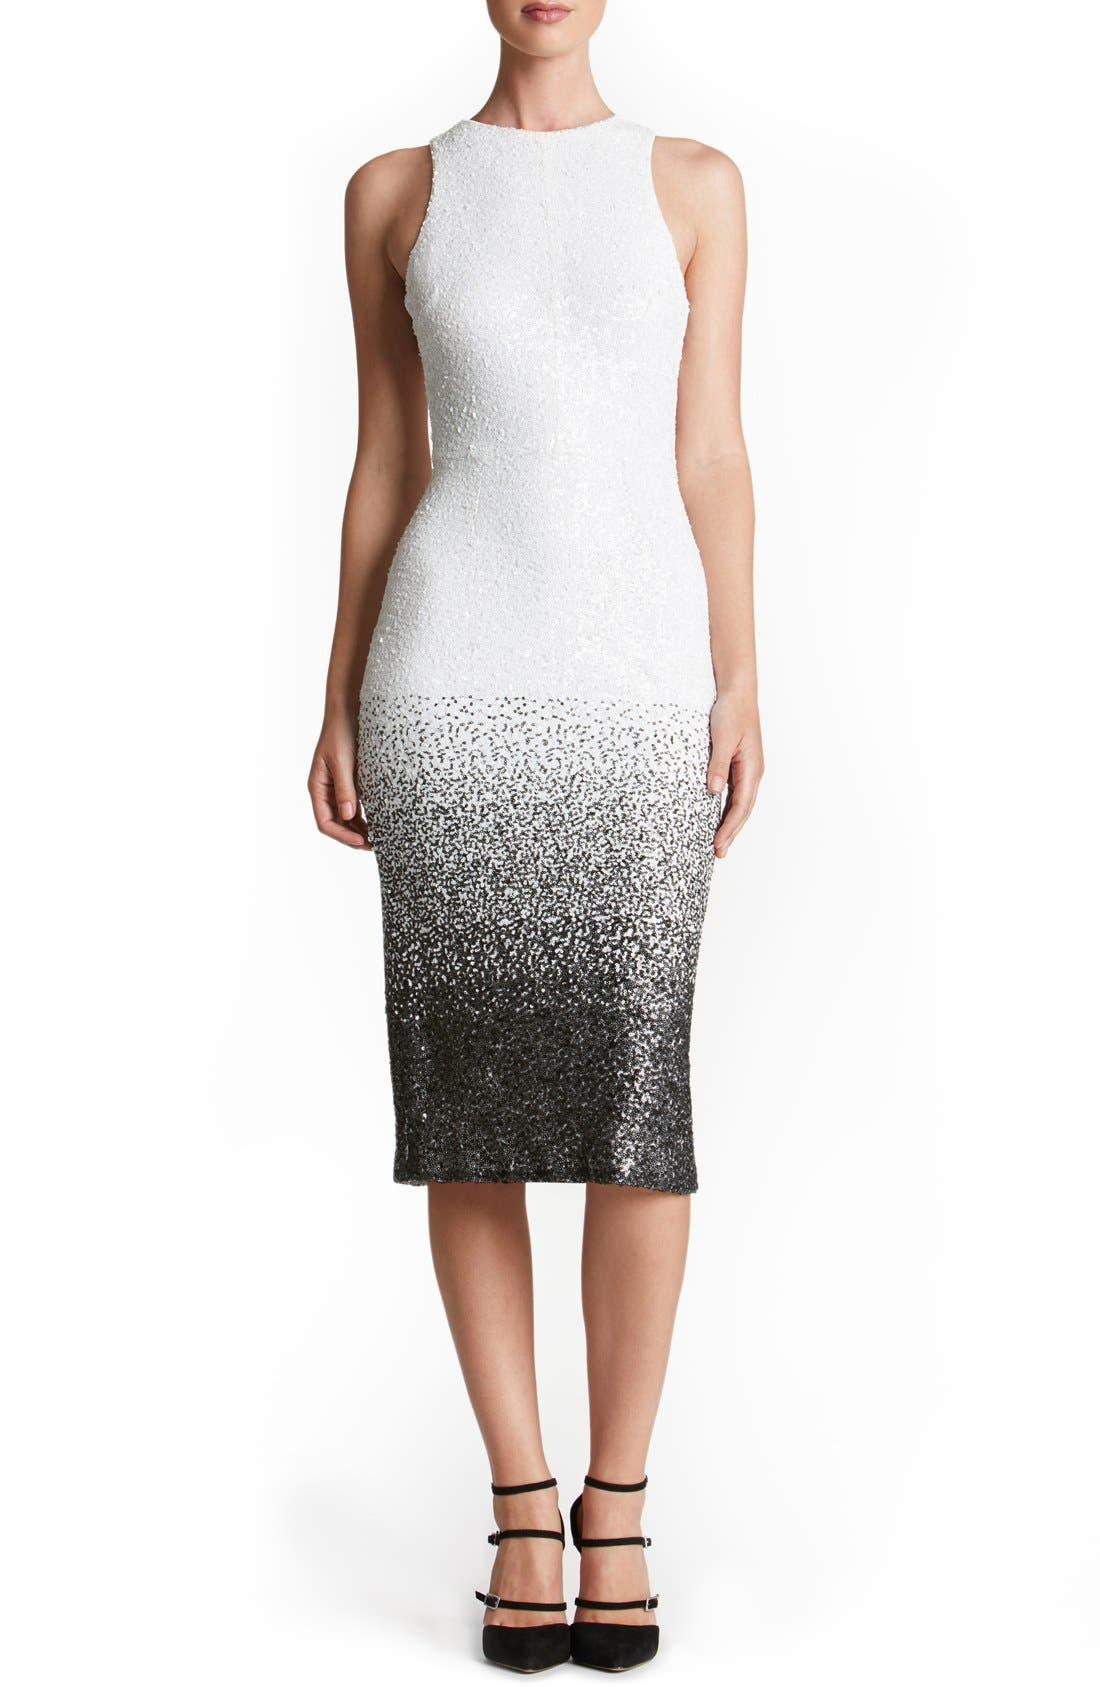 Shawn Sequin Midi Dress,                             Main thumbnail 1, color,                             121